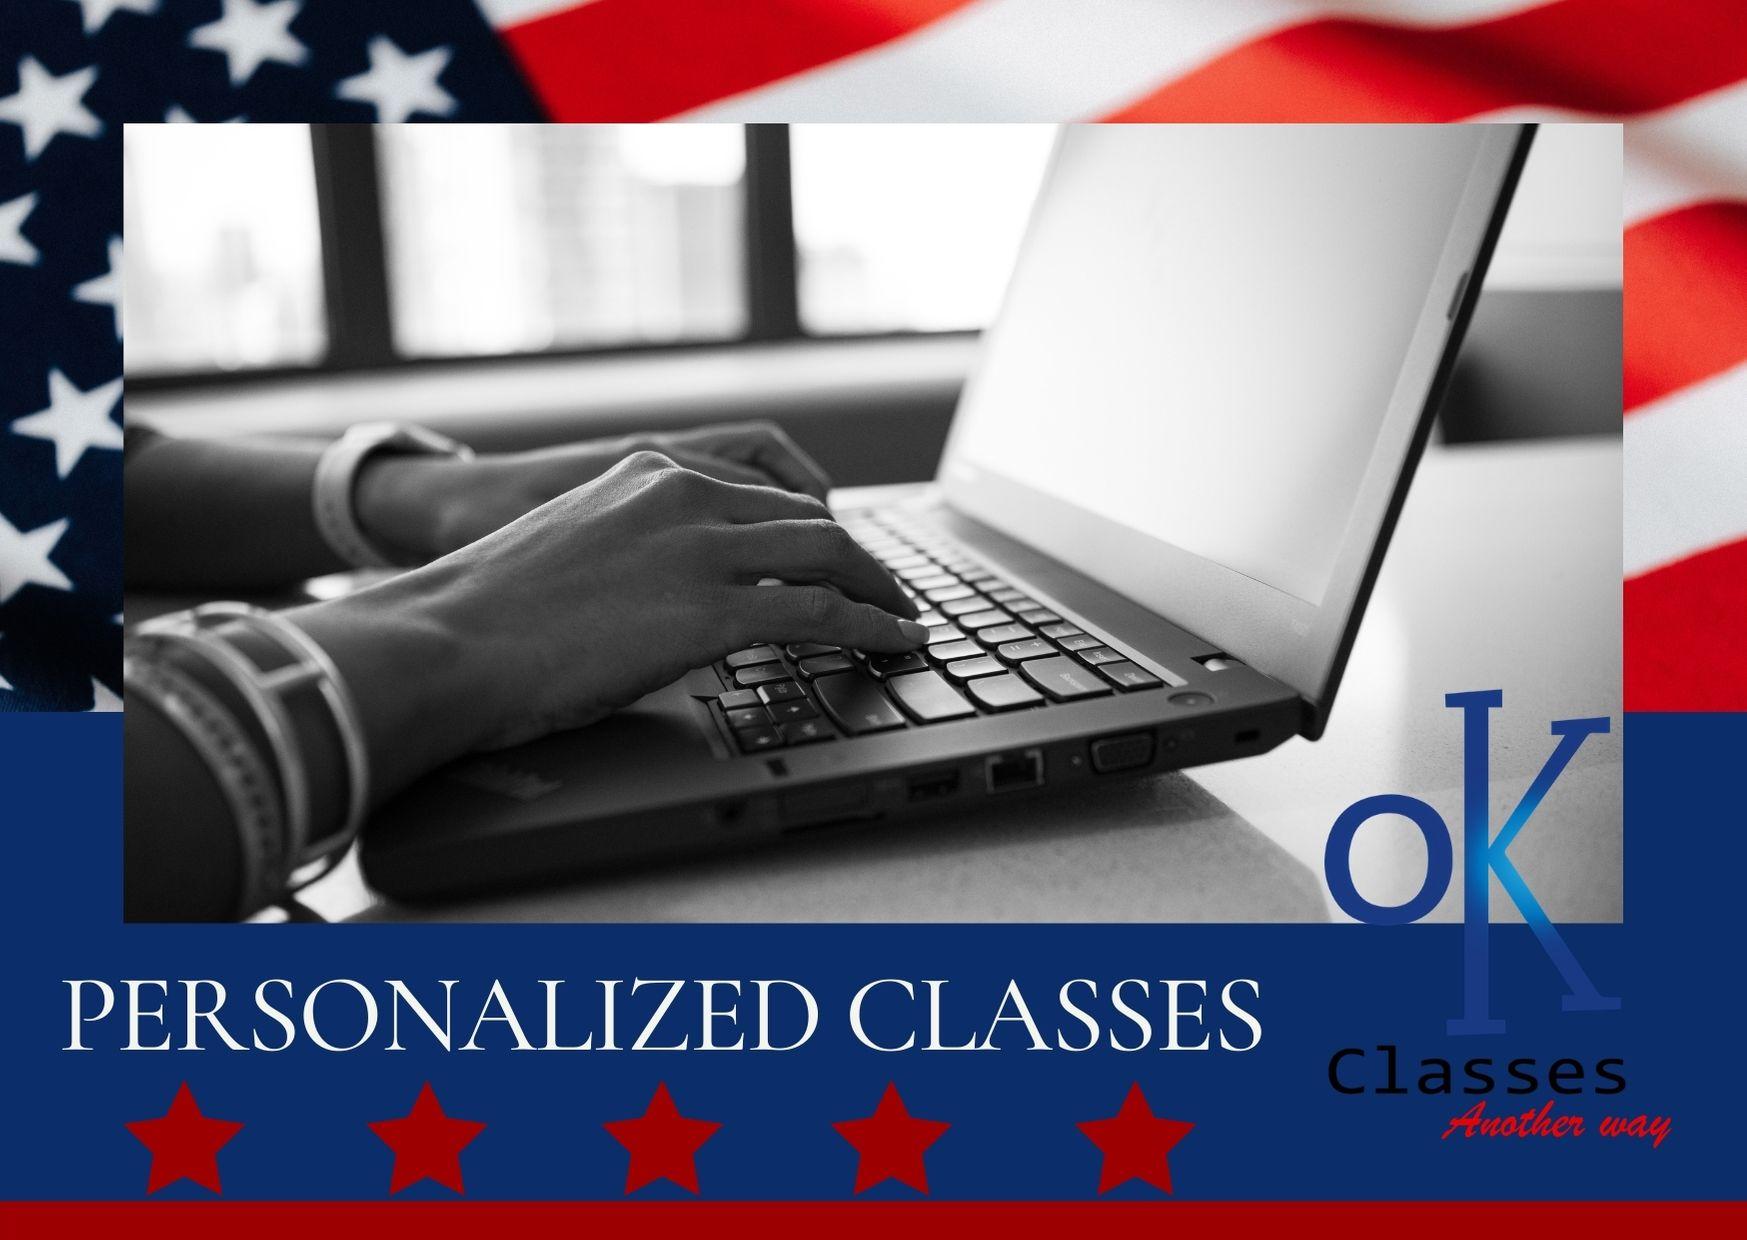 Ok Classes Personalized Classes